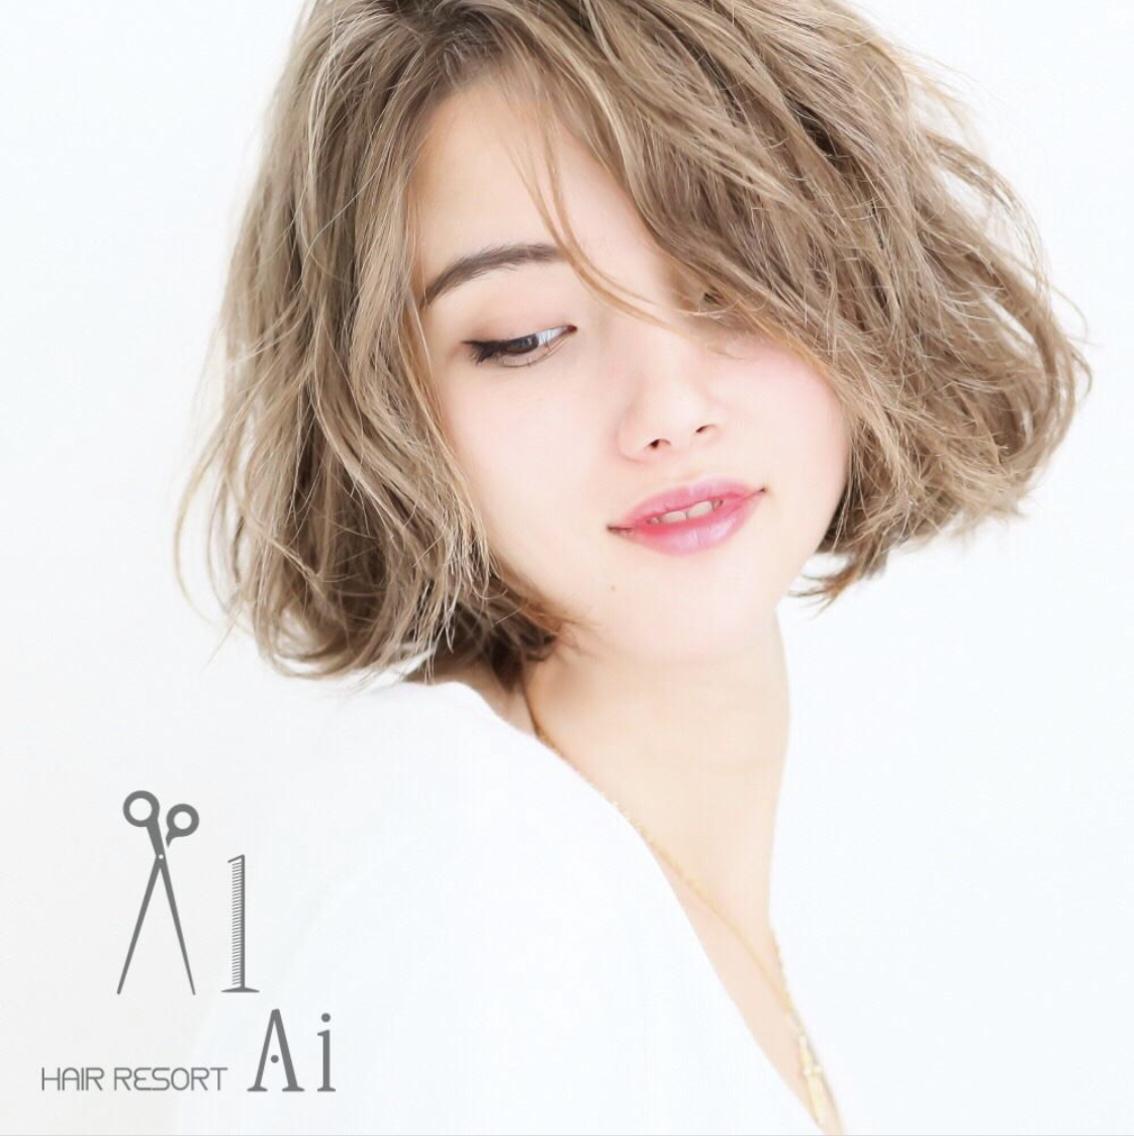 hairresortAi秋葉原店所属・hairresortAi 依田結奈の掲載